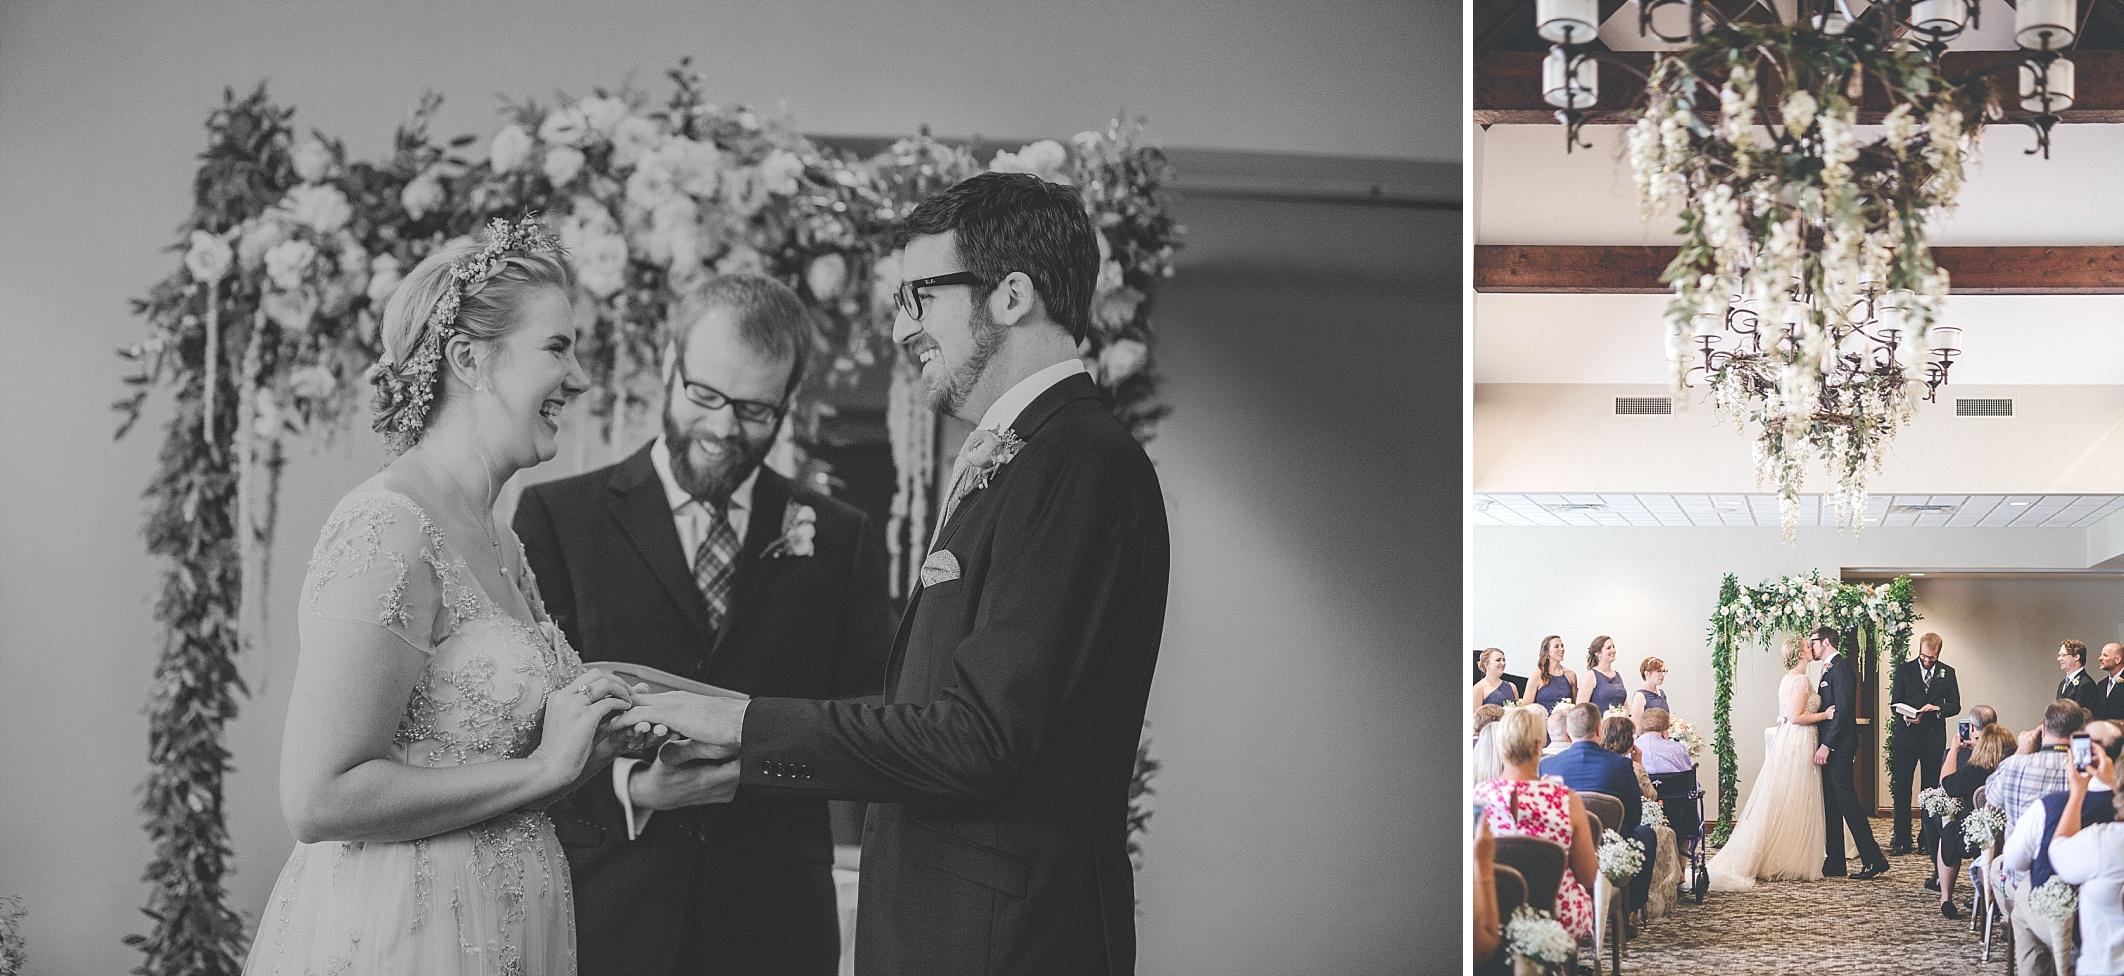 wedding-photographer-dayton-ohio_0091.jpg